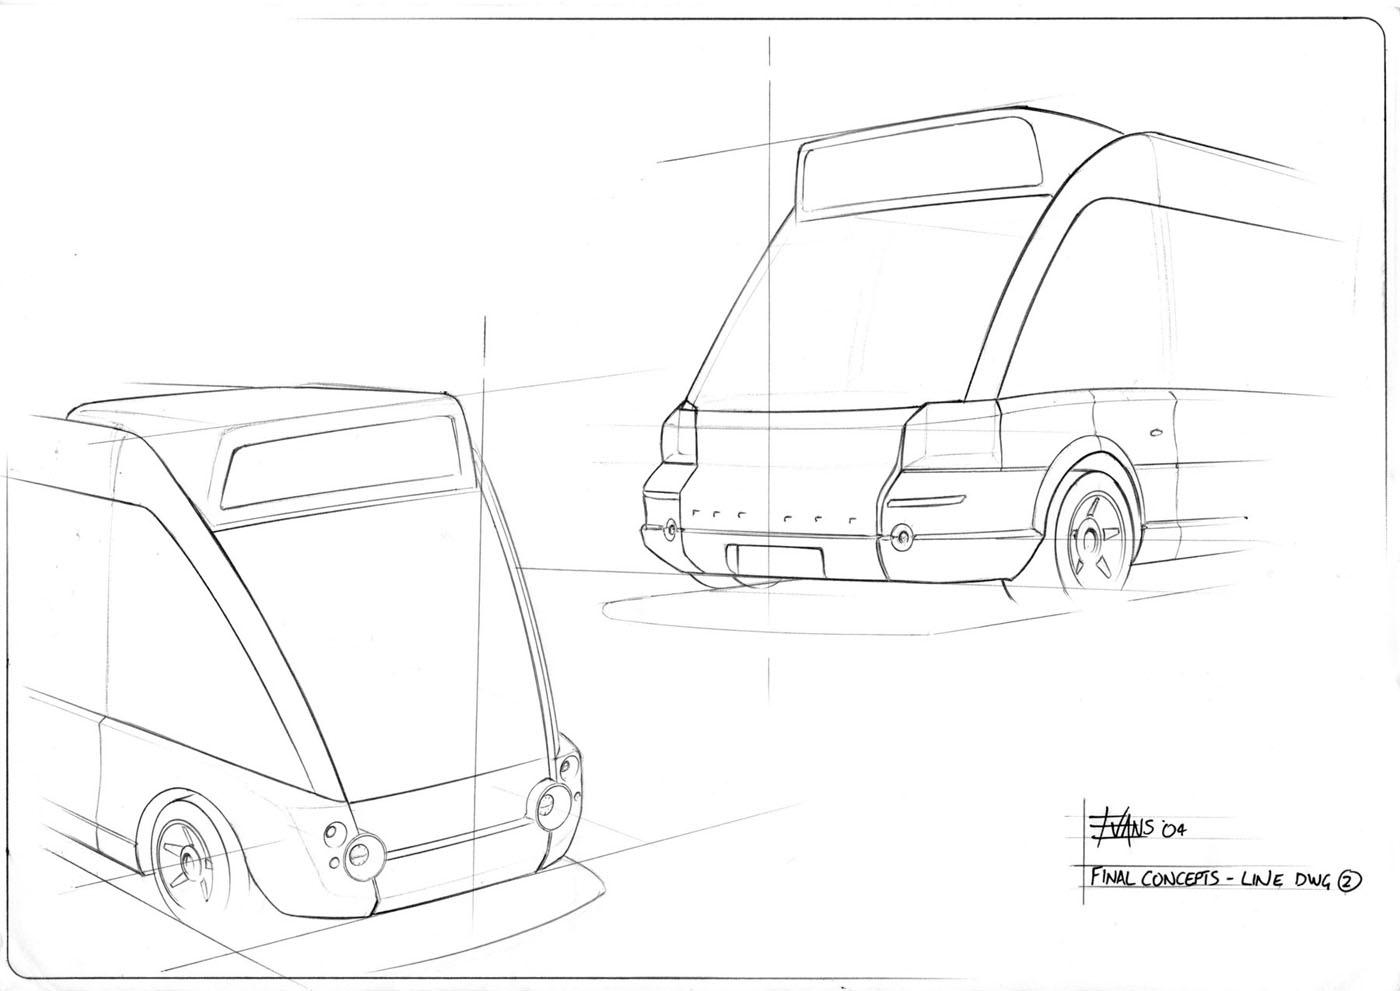 small_bus_2.jpg